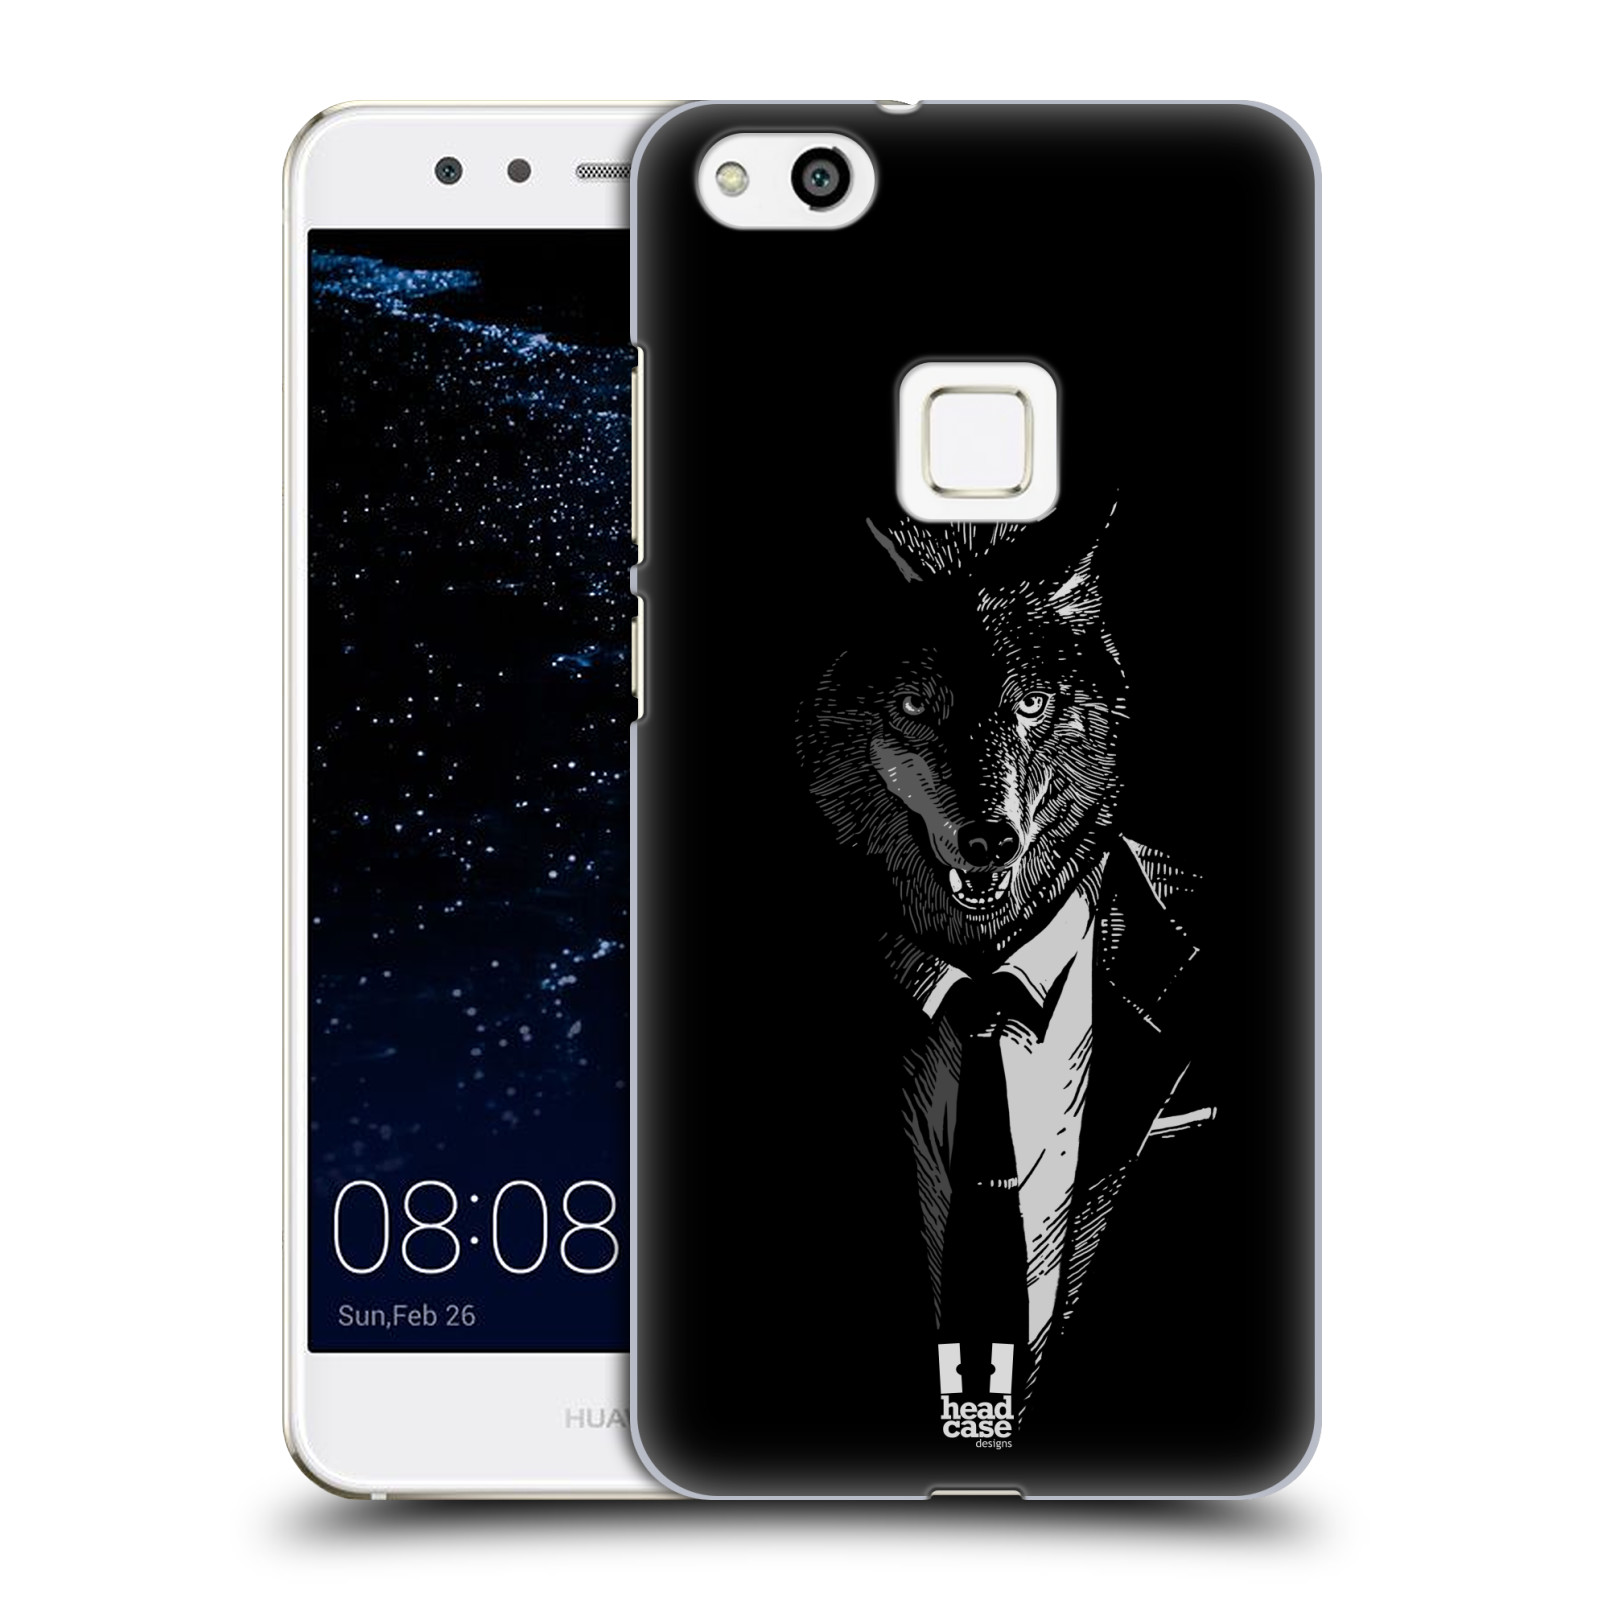 Plastové pouzdro na mobil Huawei P10 Lite Head Case - VLK V KVÁDRU (Plastový kryt či obal na mobilní telefon Huawei P10 Lite Dual SIM (LX1/LX1A))